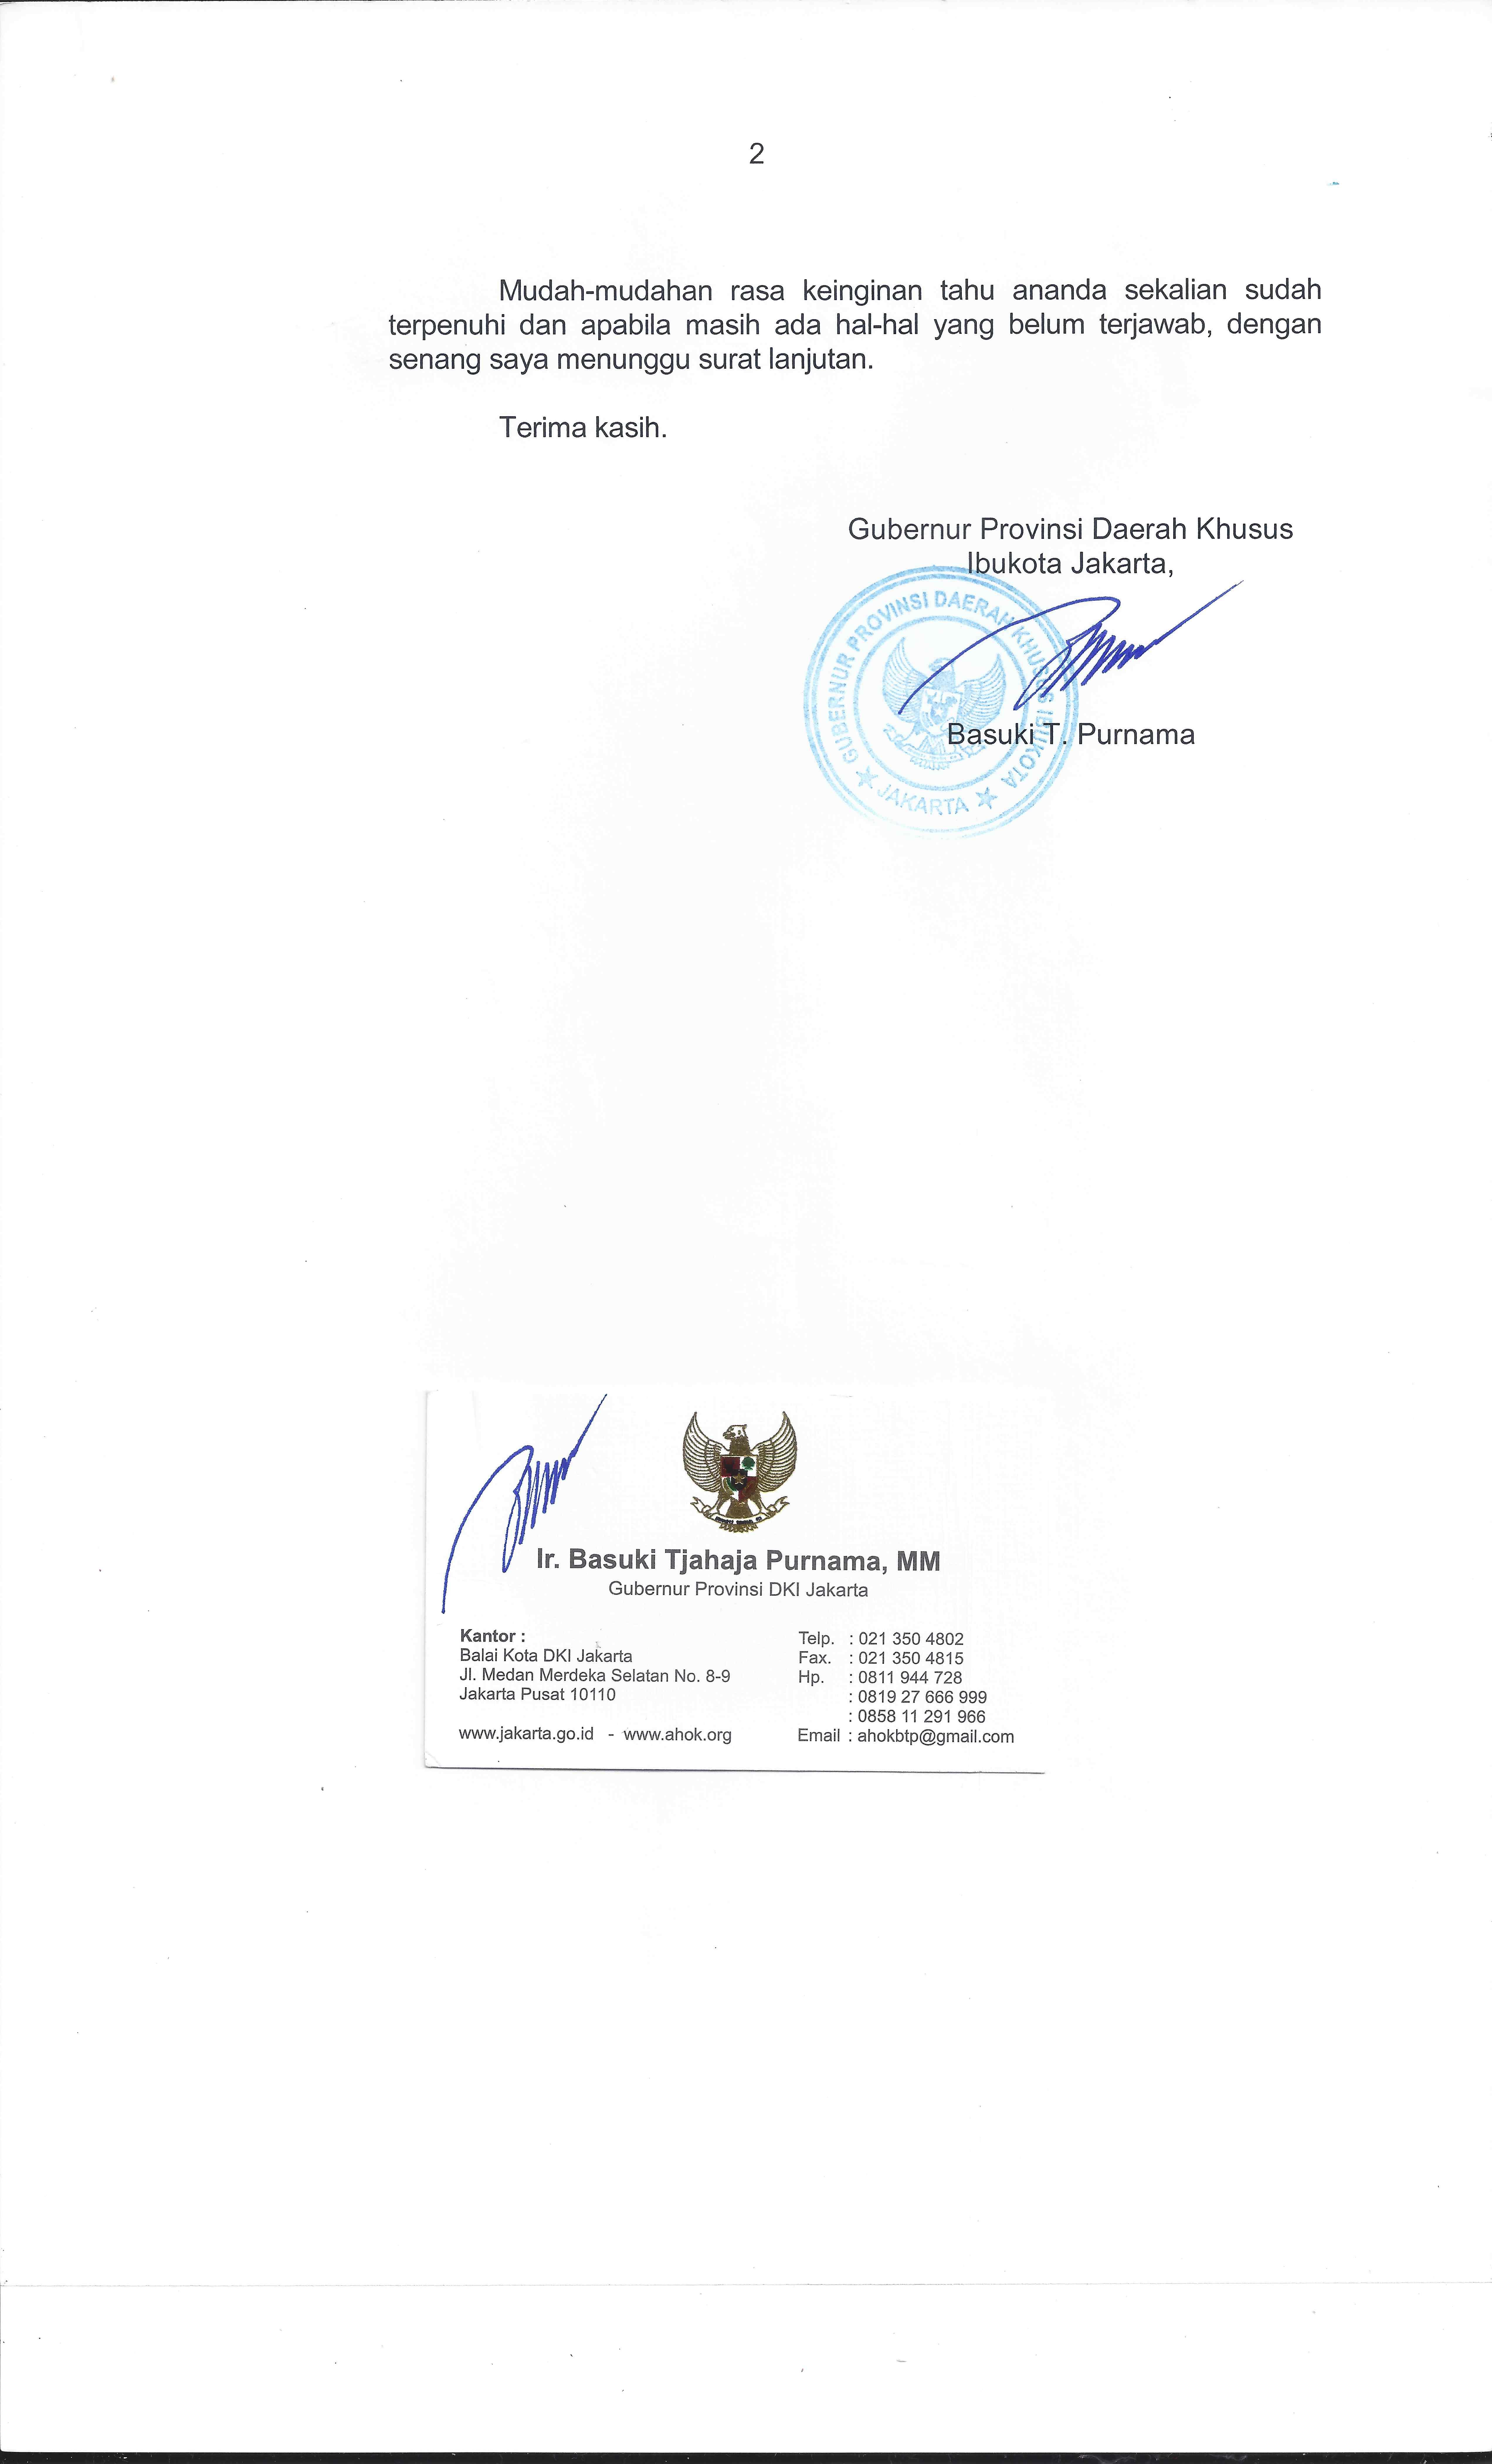 surat dari Ahok_Page_2